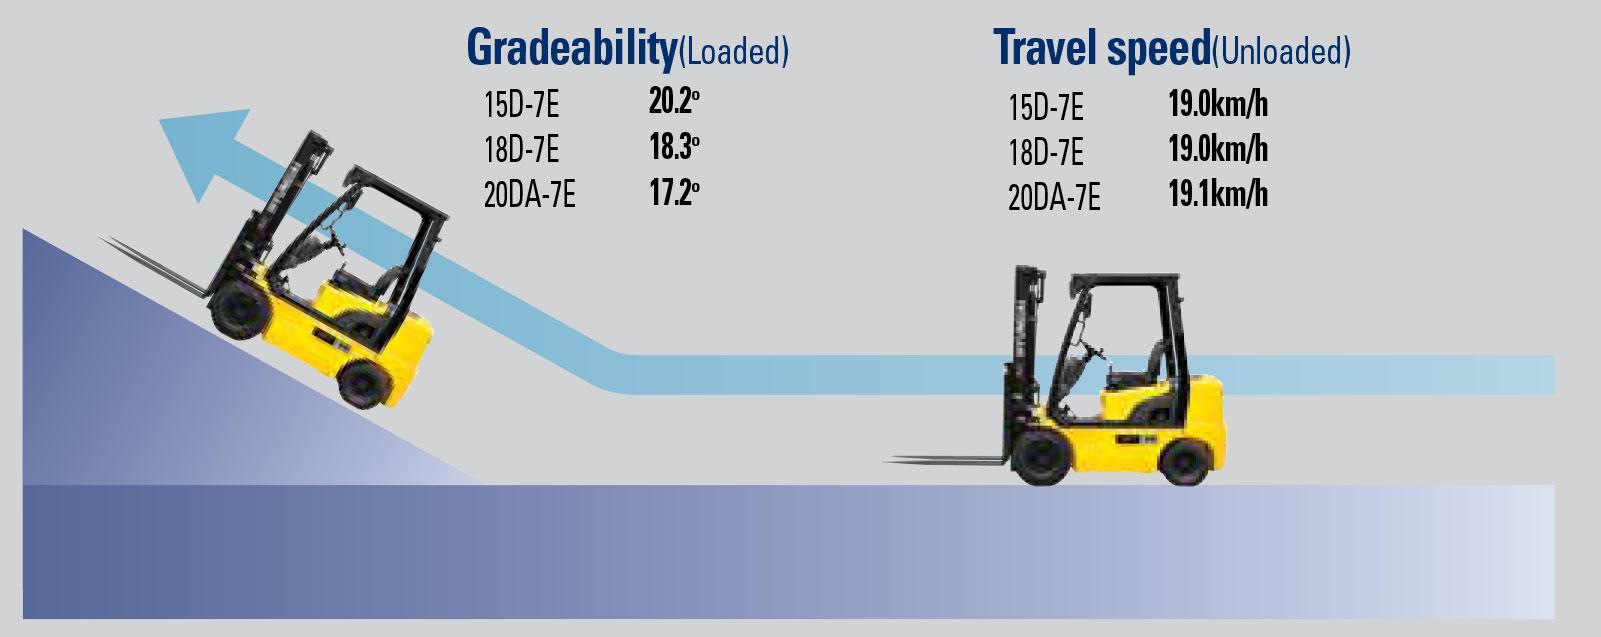 Faster travel speed & gradeability